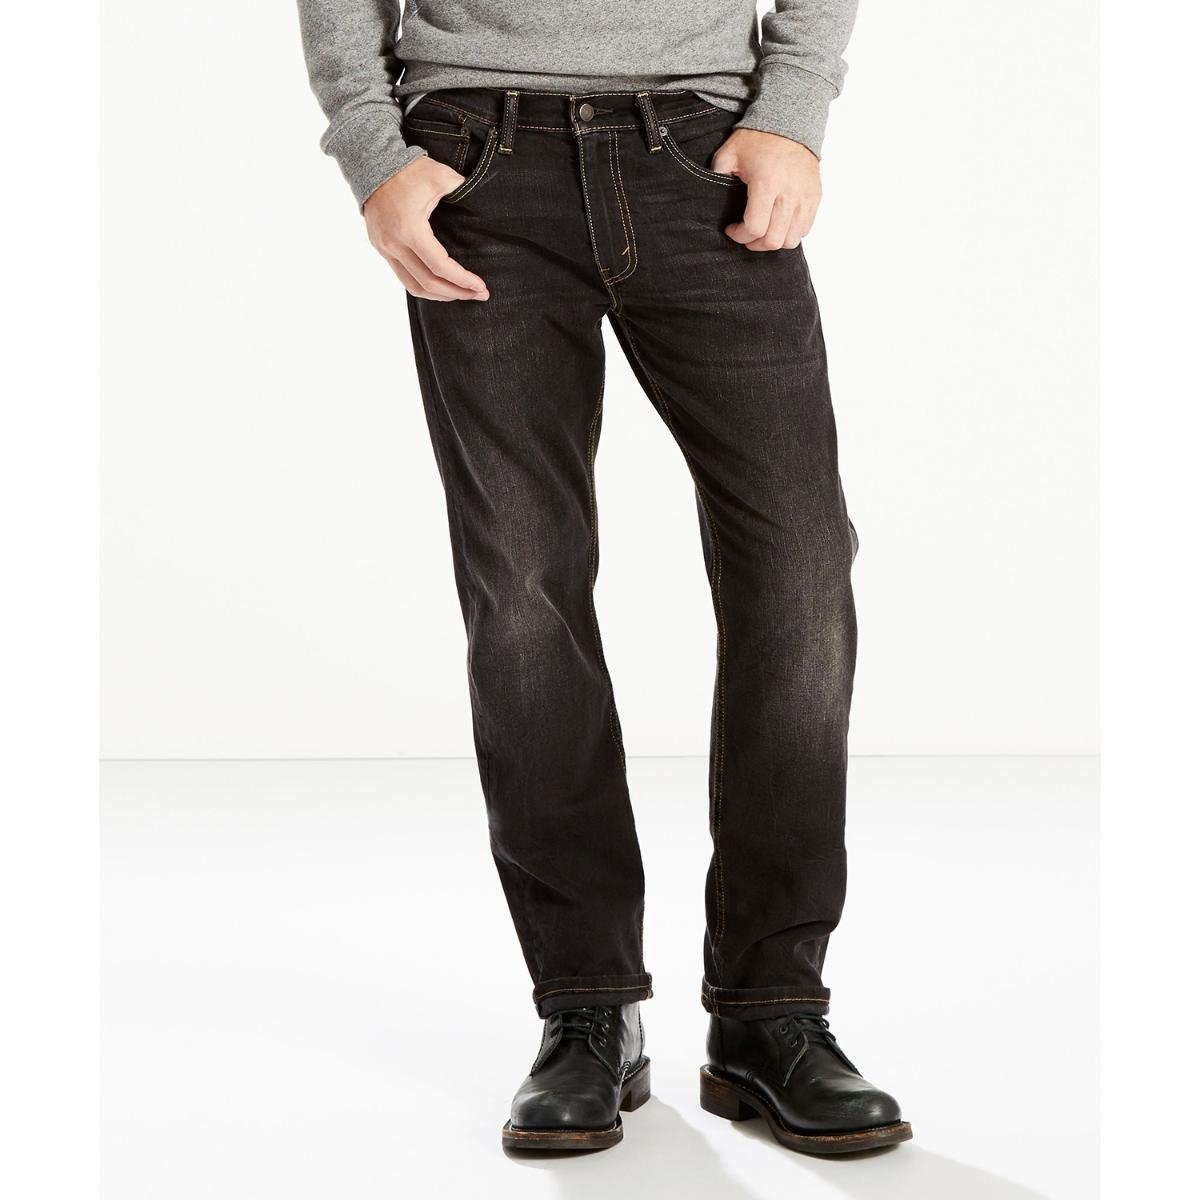 9460cdfbc4d43 Calça Jeans 505 Regular Levis - Compre Agora